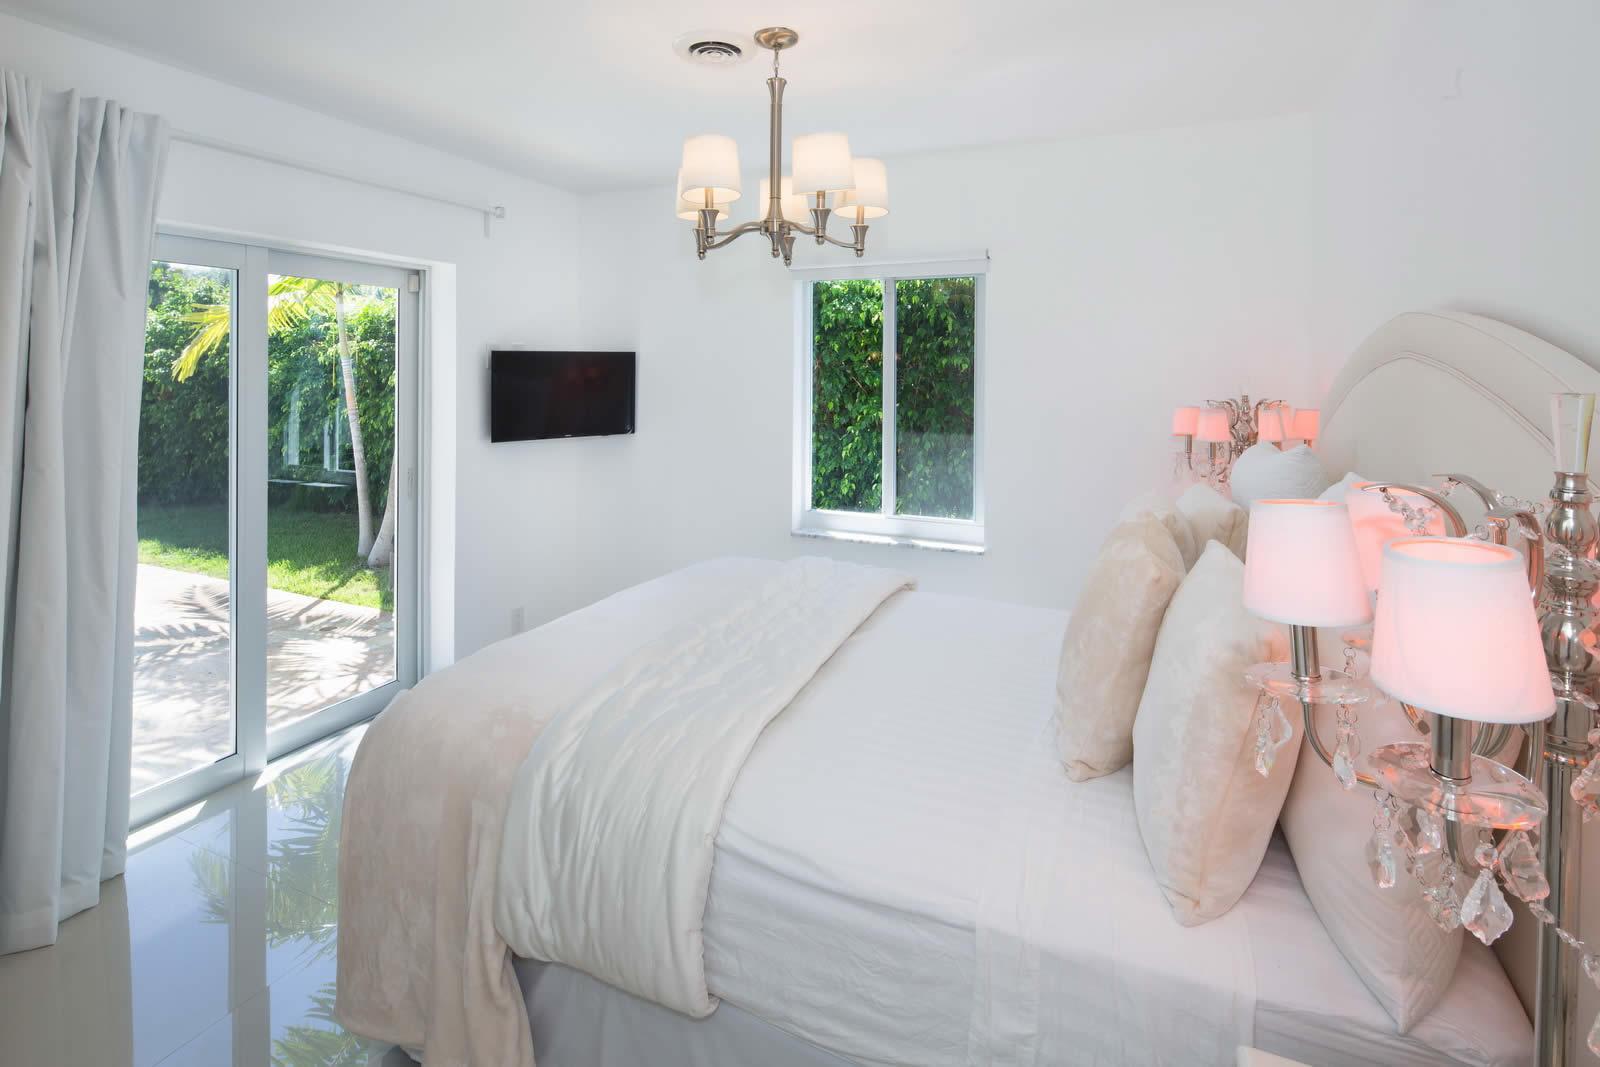 villa-a-vendre-deerfield-beach-maison-renovee-piscine-acces-ocean